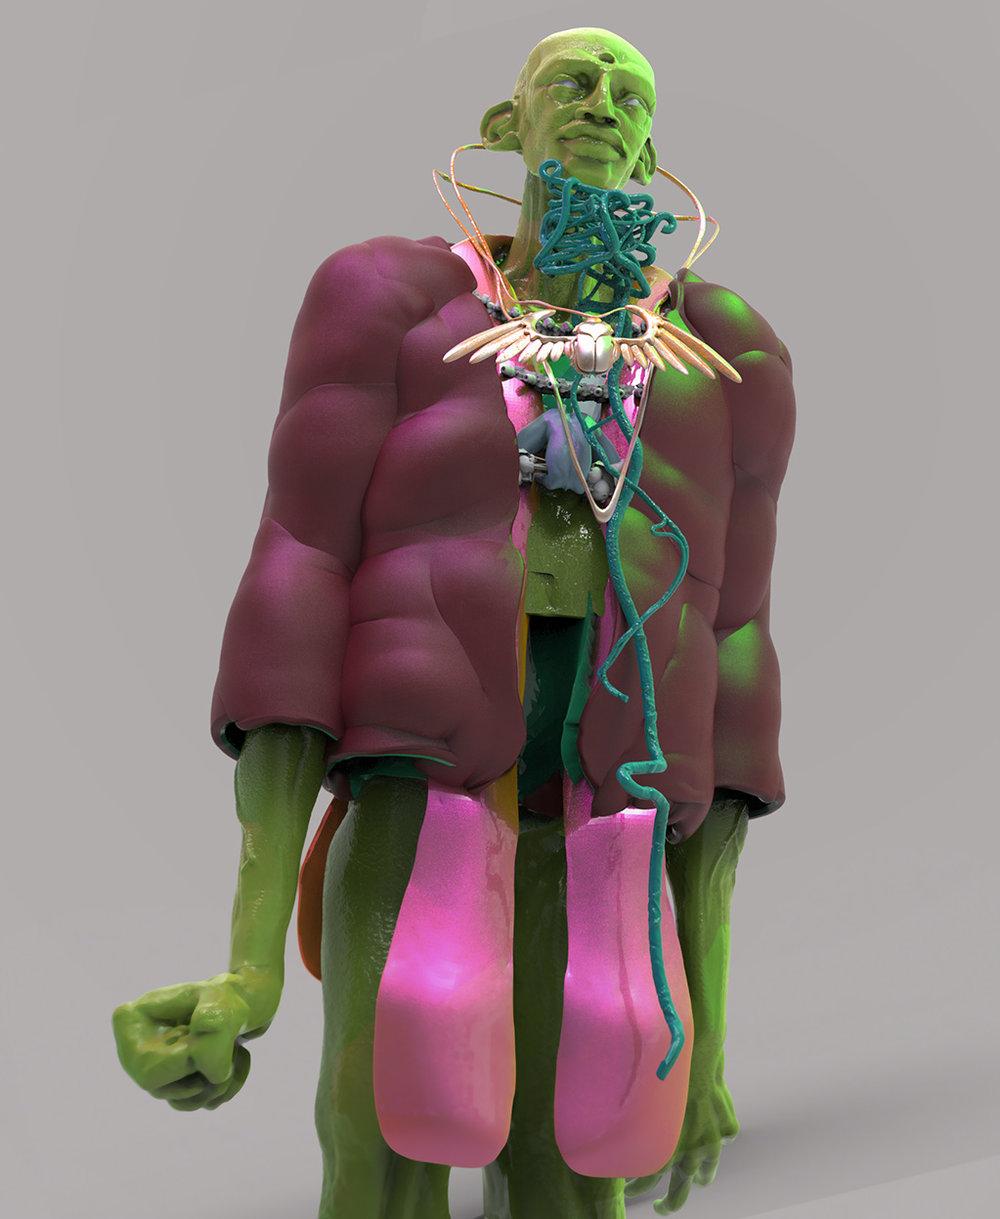 Max+Brazier-Jones+concept+art+nomad+costume+design.jpeg